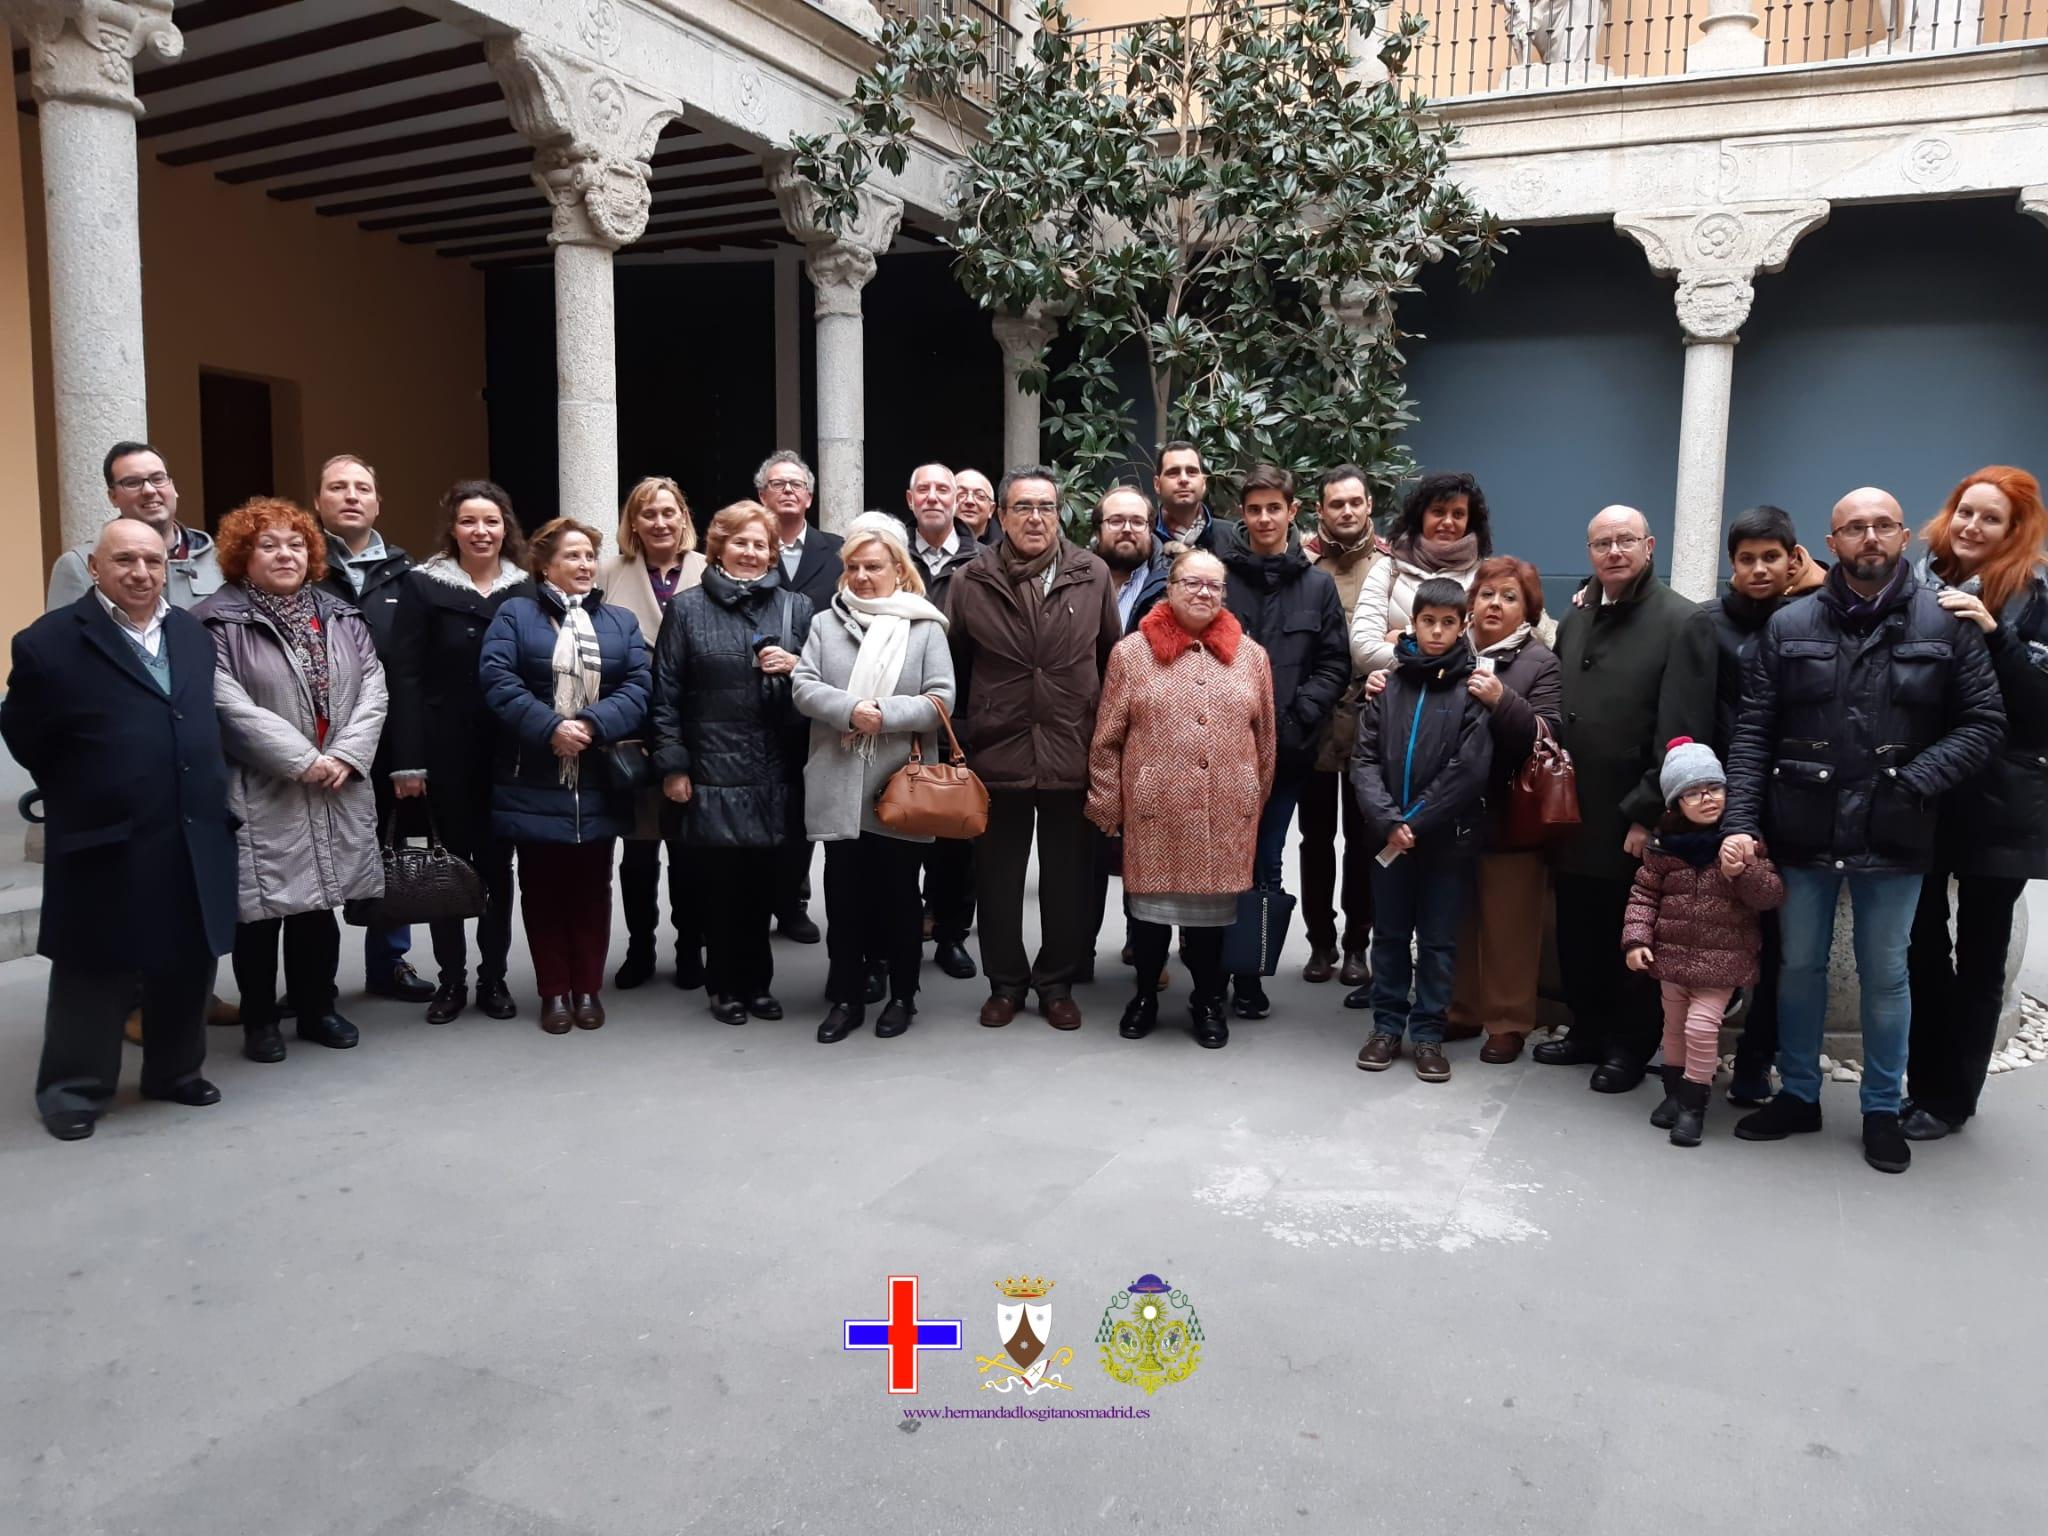 Peregrinacion-s.isidro-19-14-esc